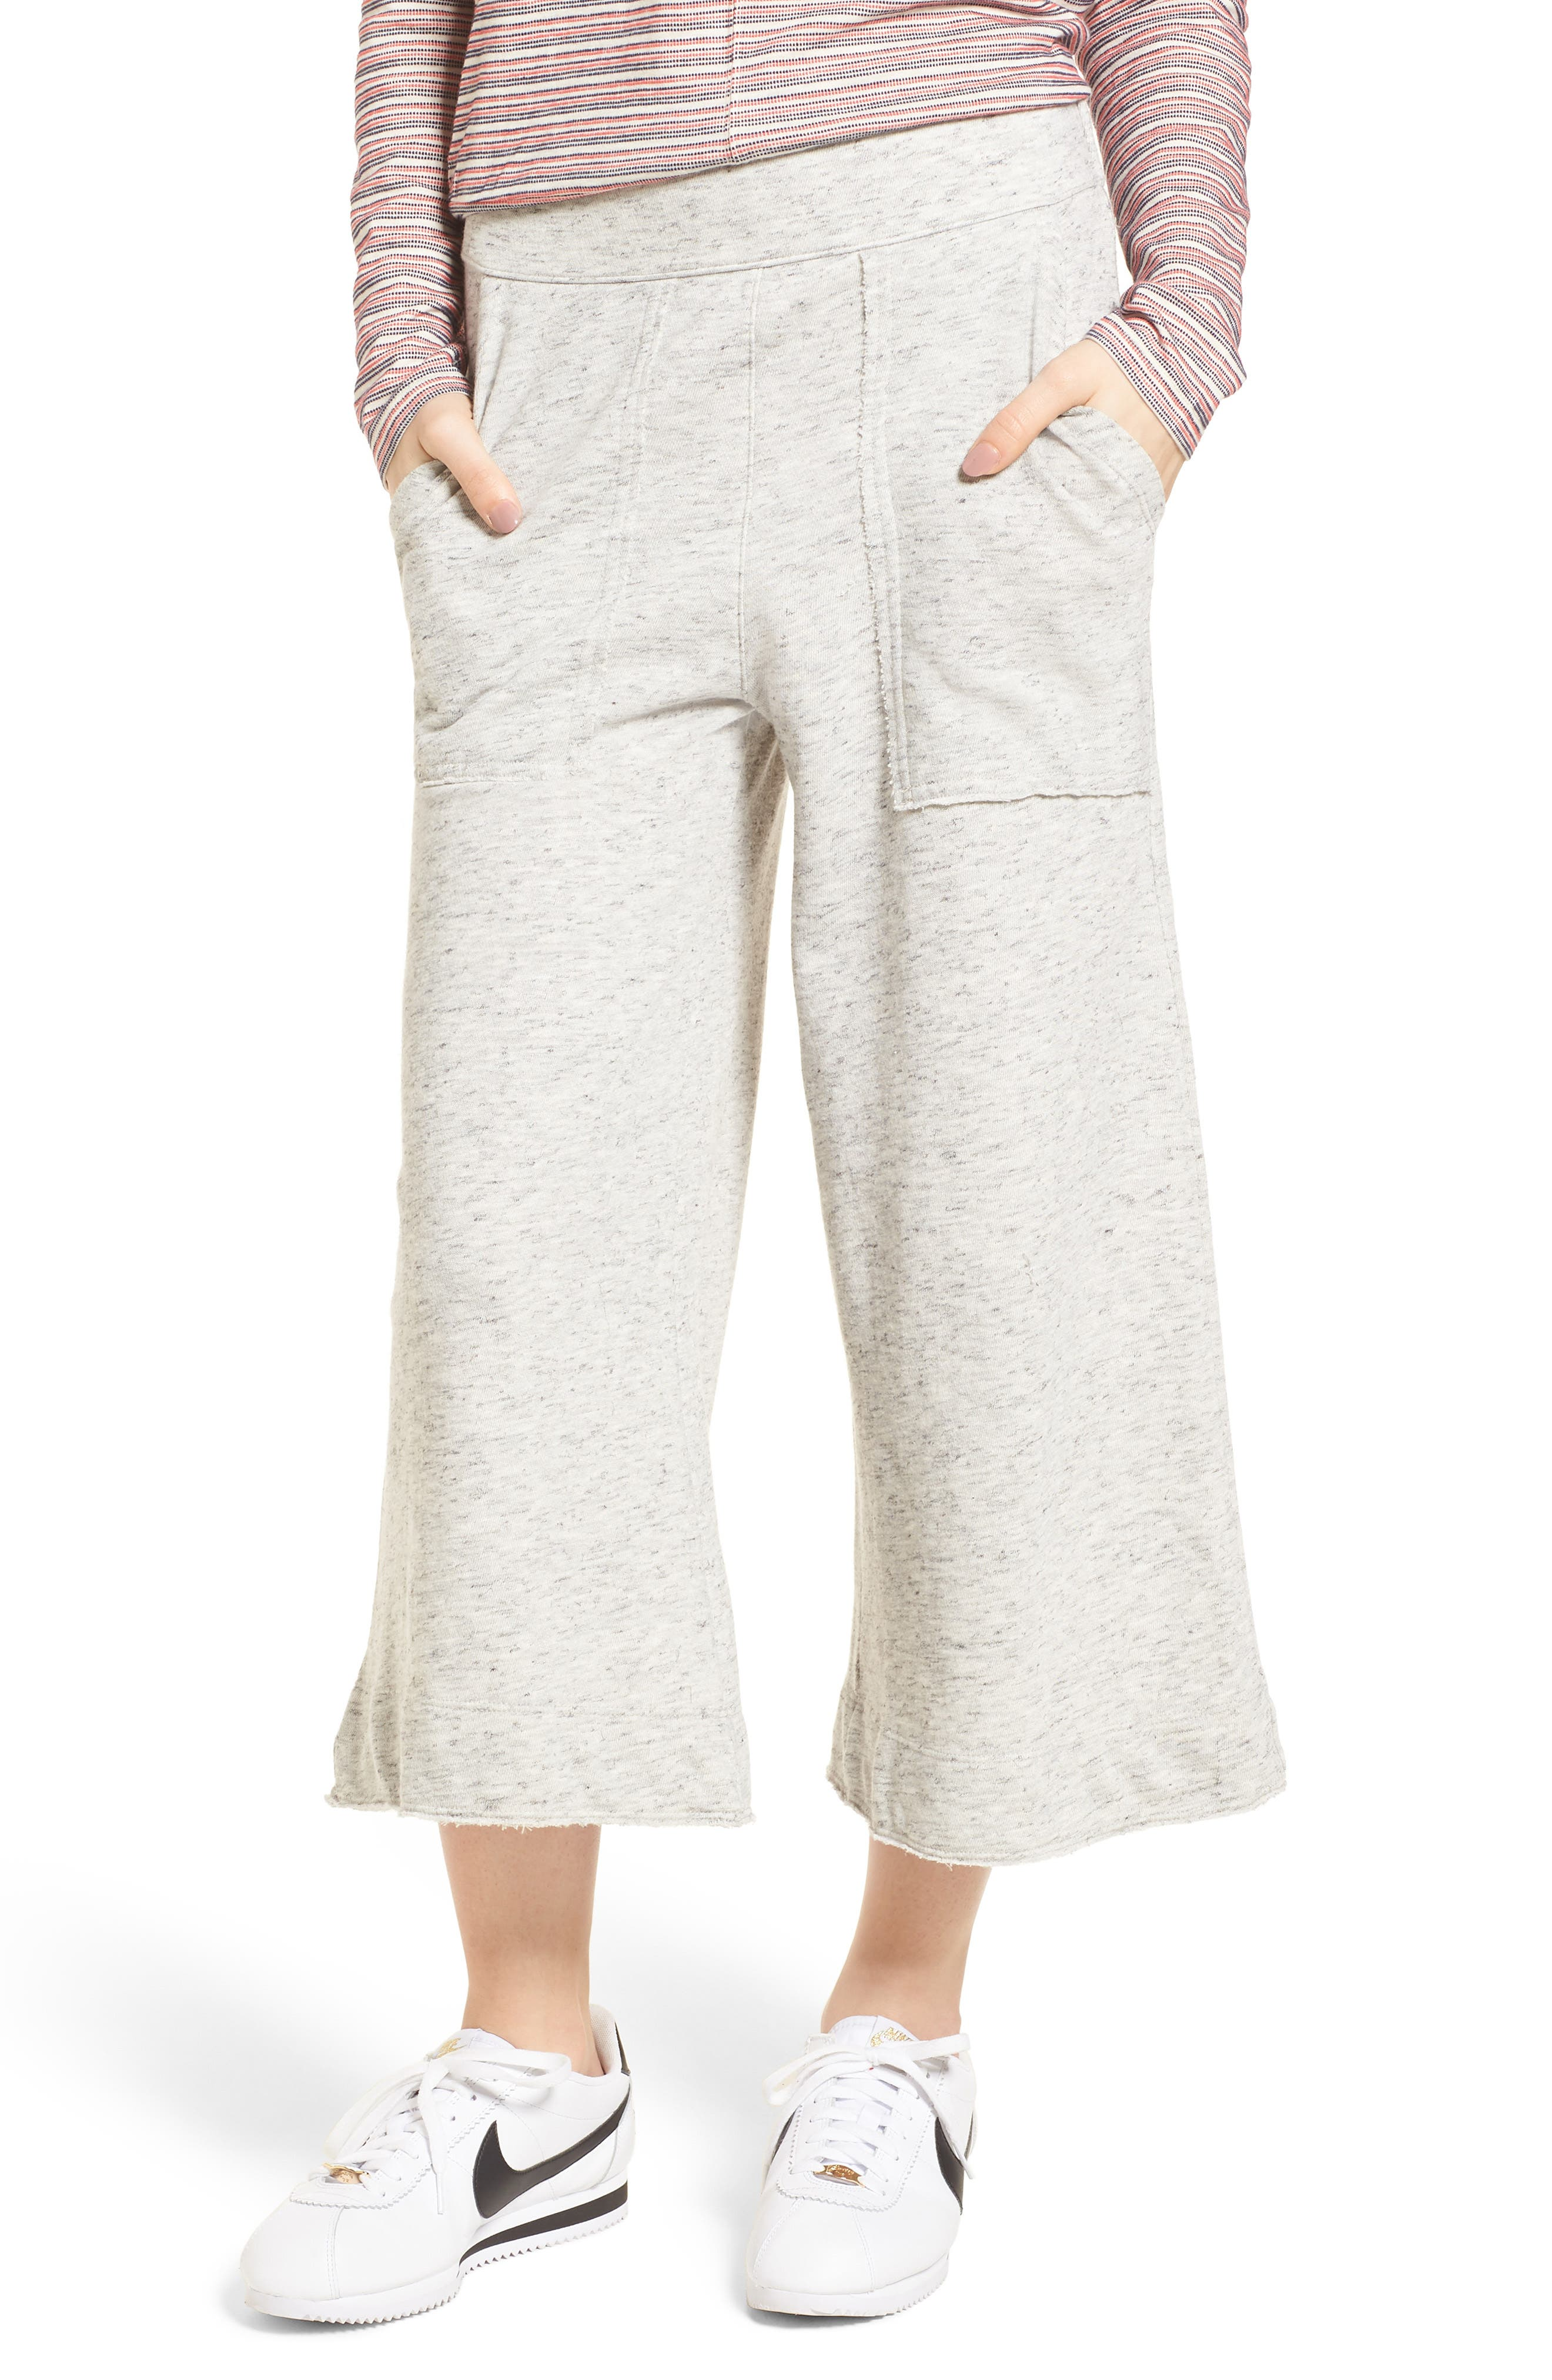 Sidelight Culotte Sweatpants,                         Main,                         color, Grey